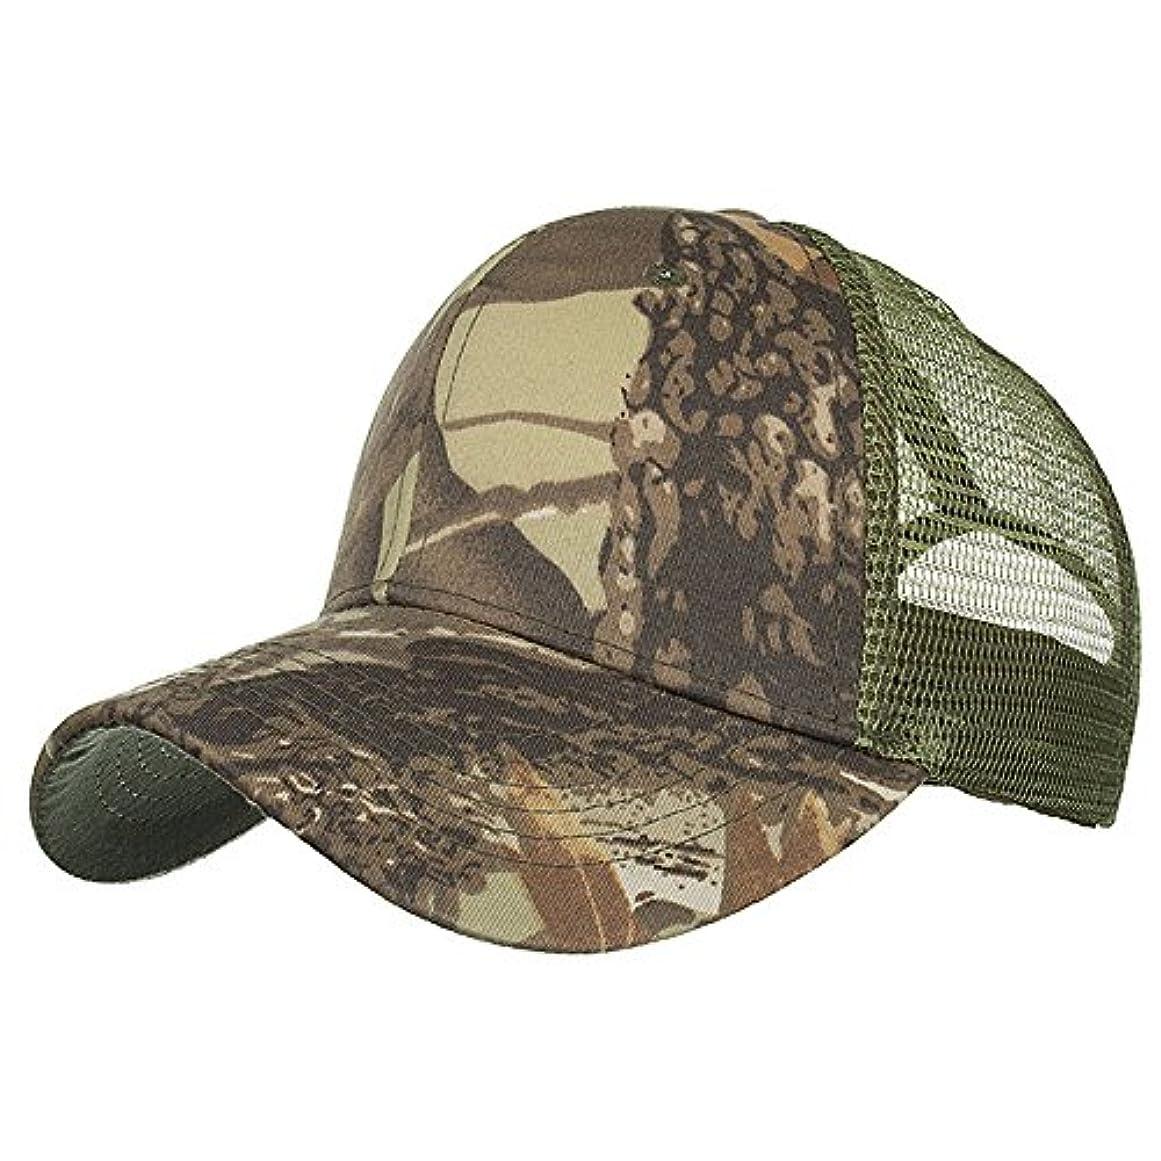 Racazing Cap 迷彩 野球帽 メッシュステッチ 通気性のある 帽子 夏 登山 可調整可能 刺繍 棒球帽 UV 帽子 軽量 屋外 Unisex Hat (C)